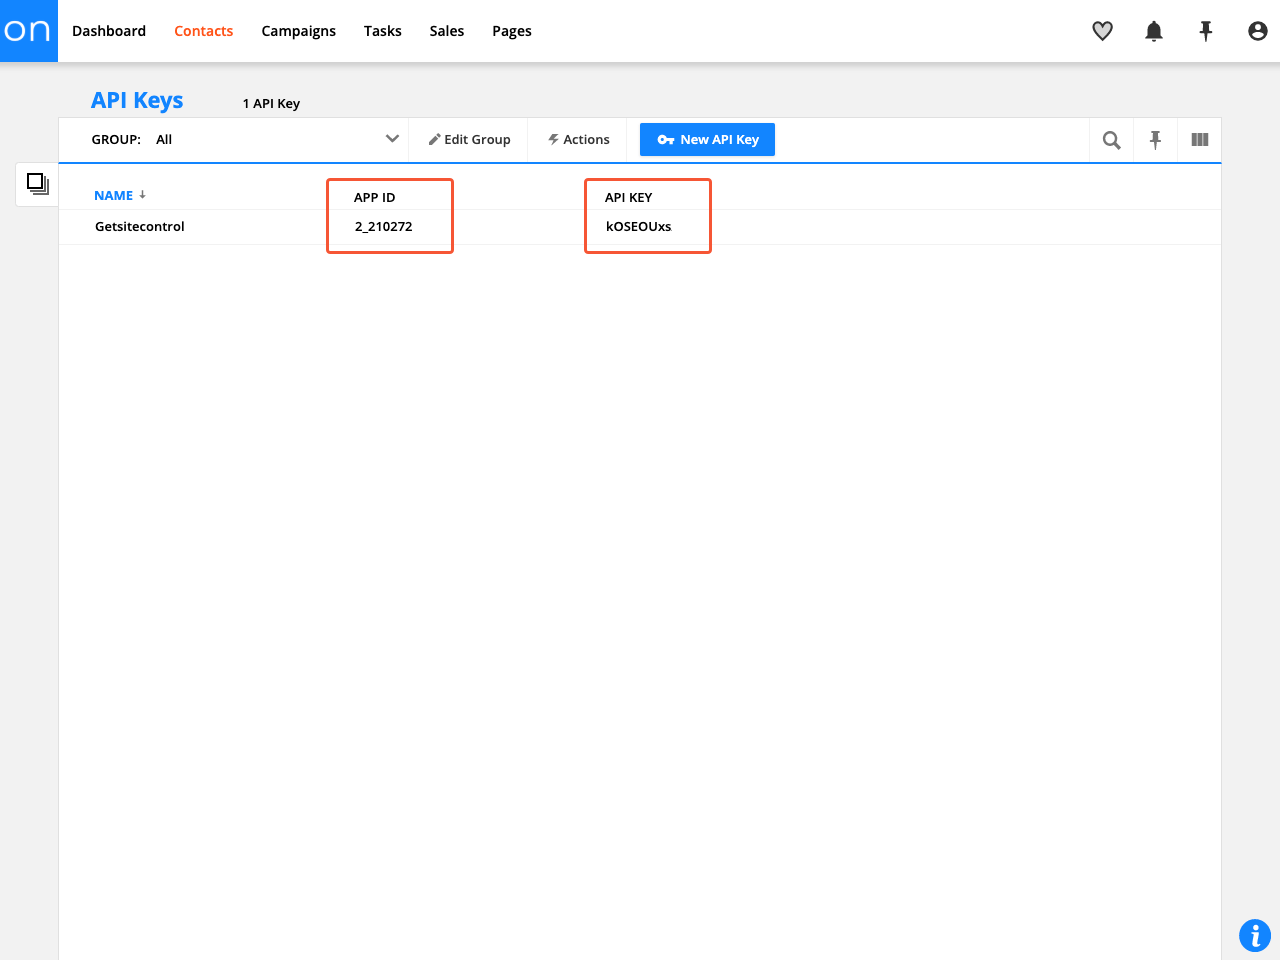 Ontraport API Keys section